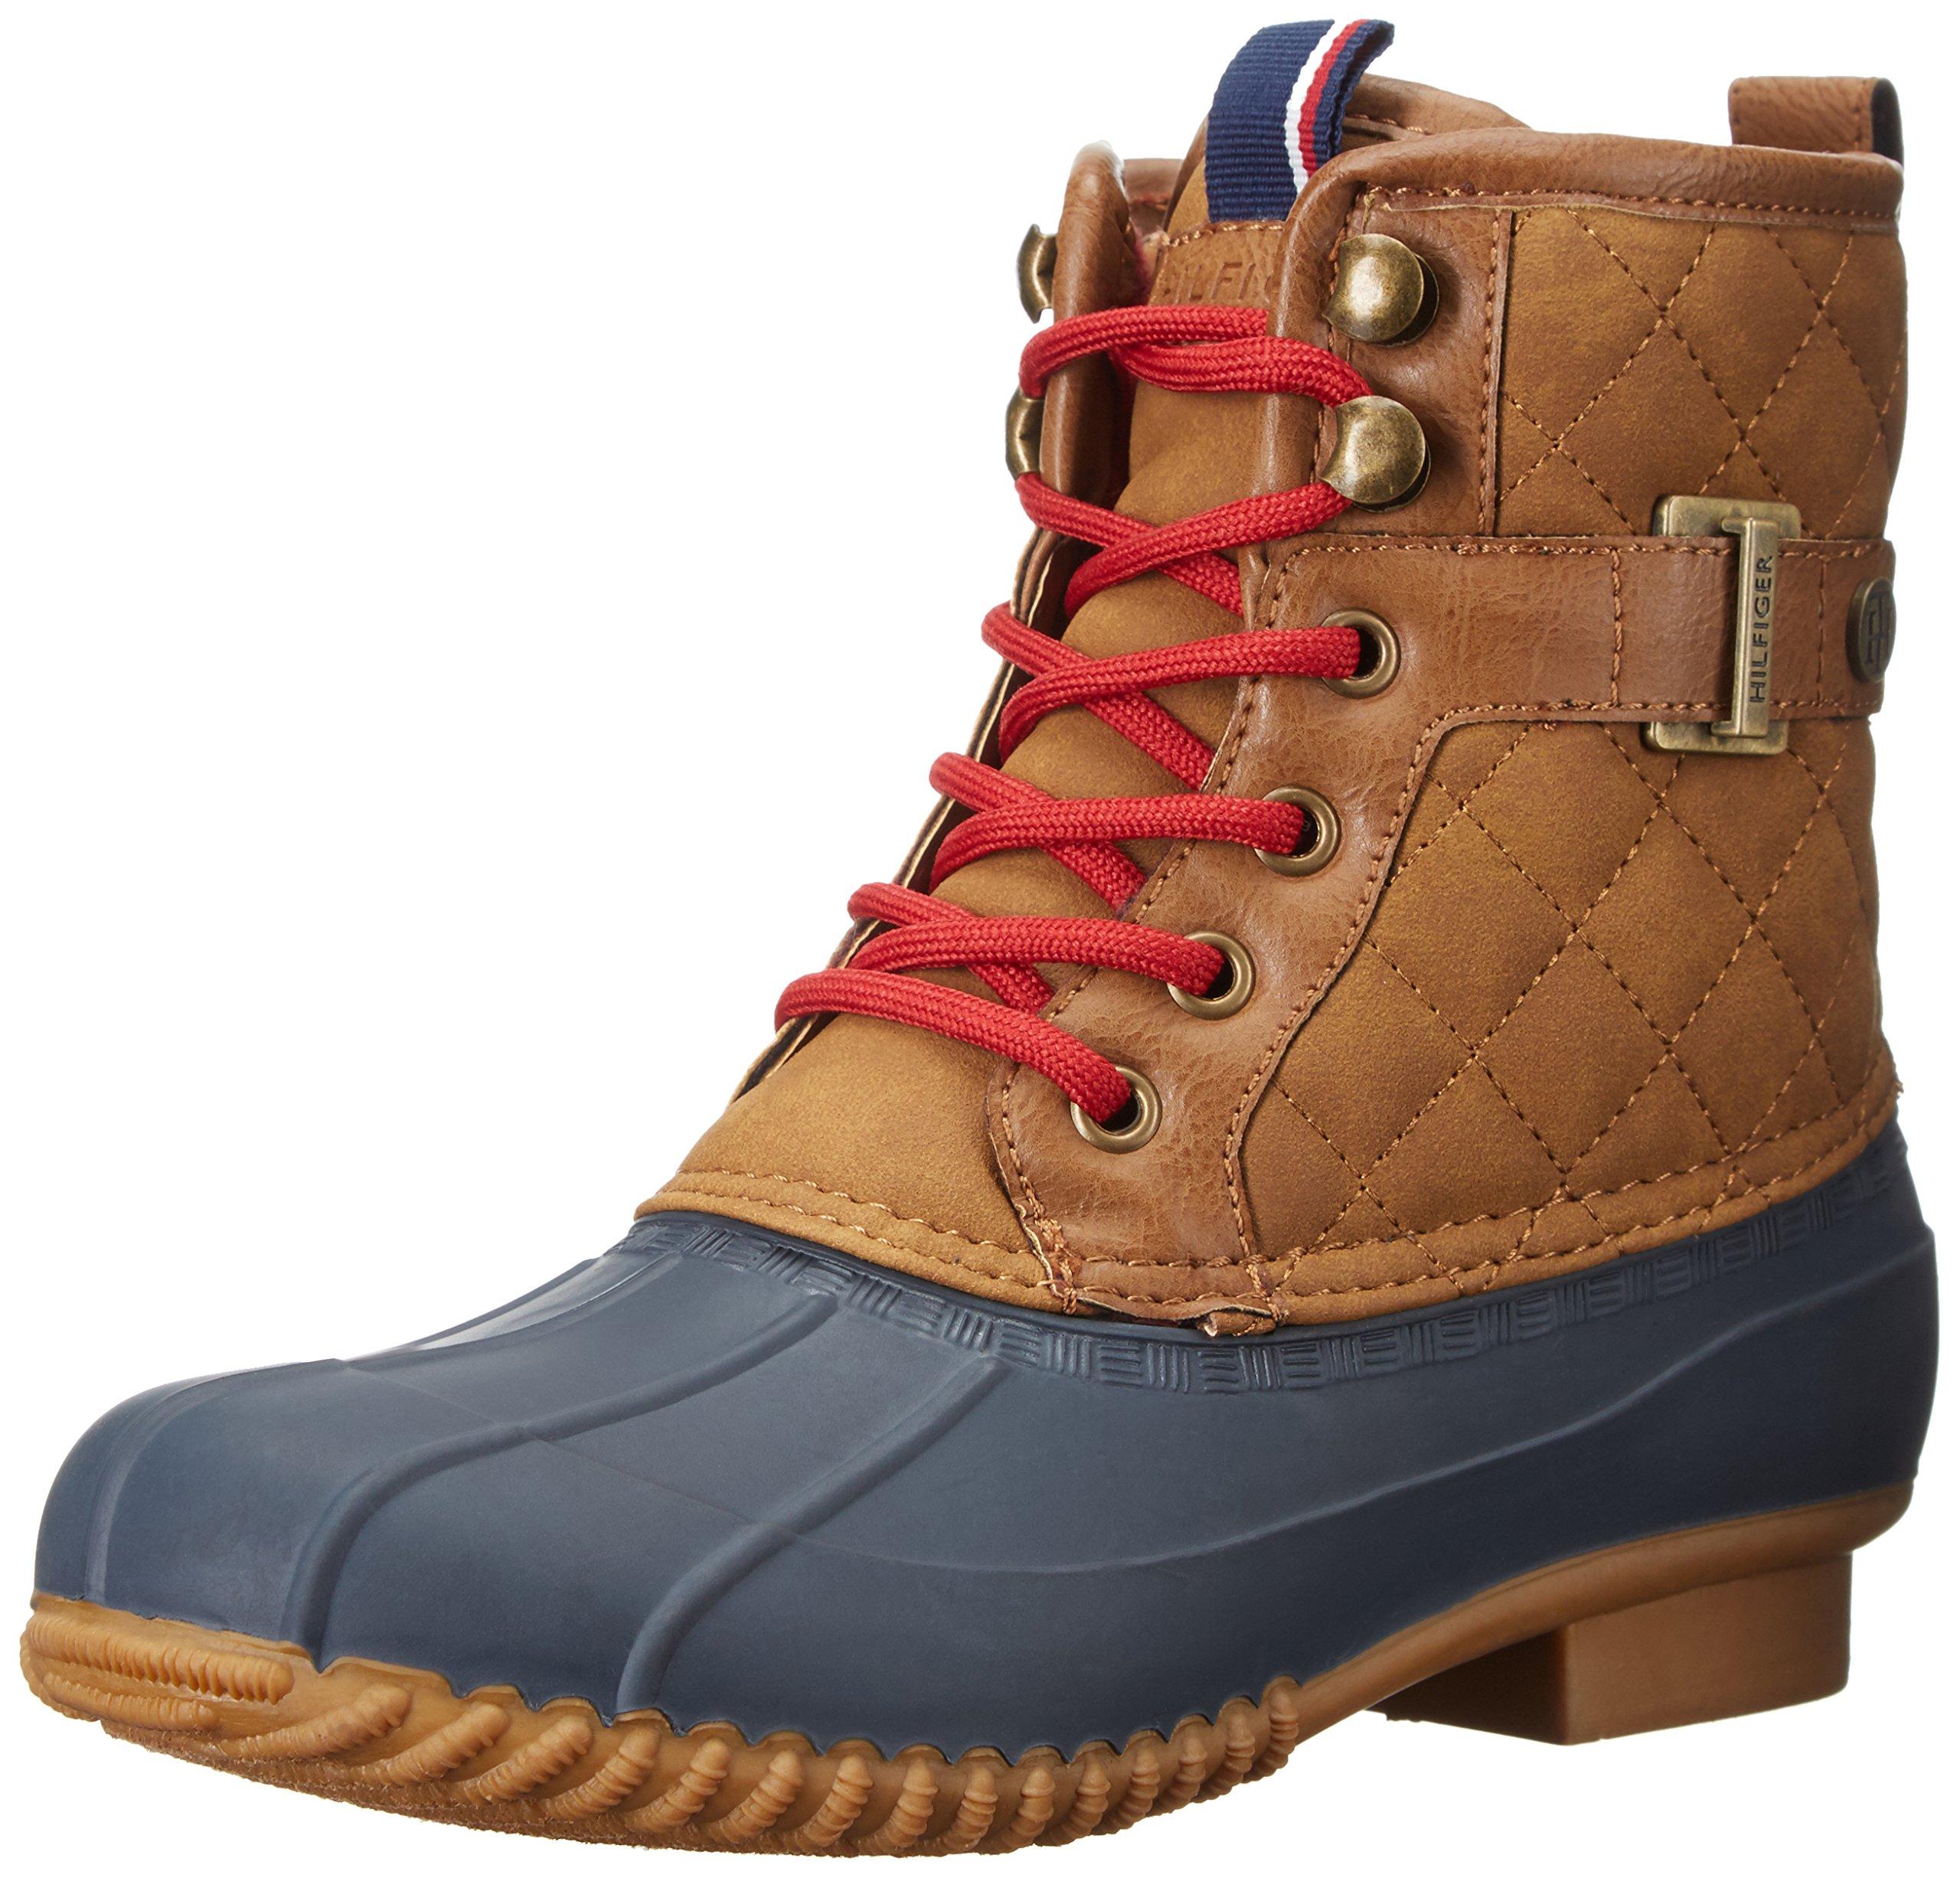 Ducks Boots: Amazon.com